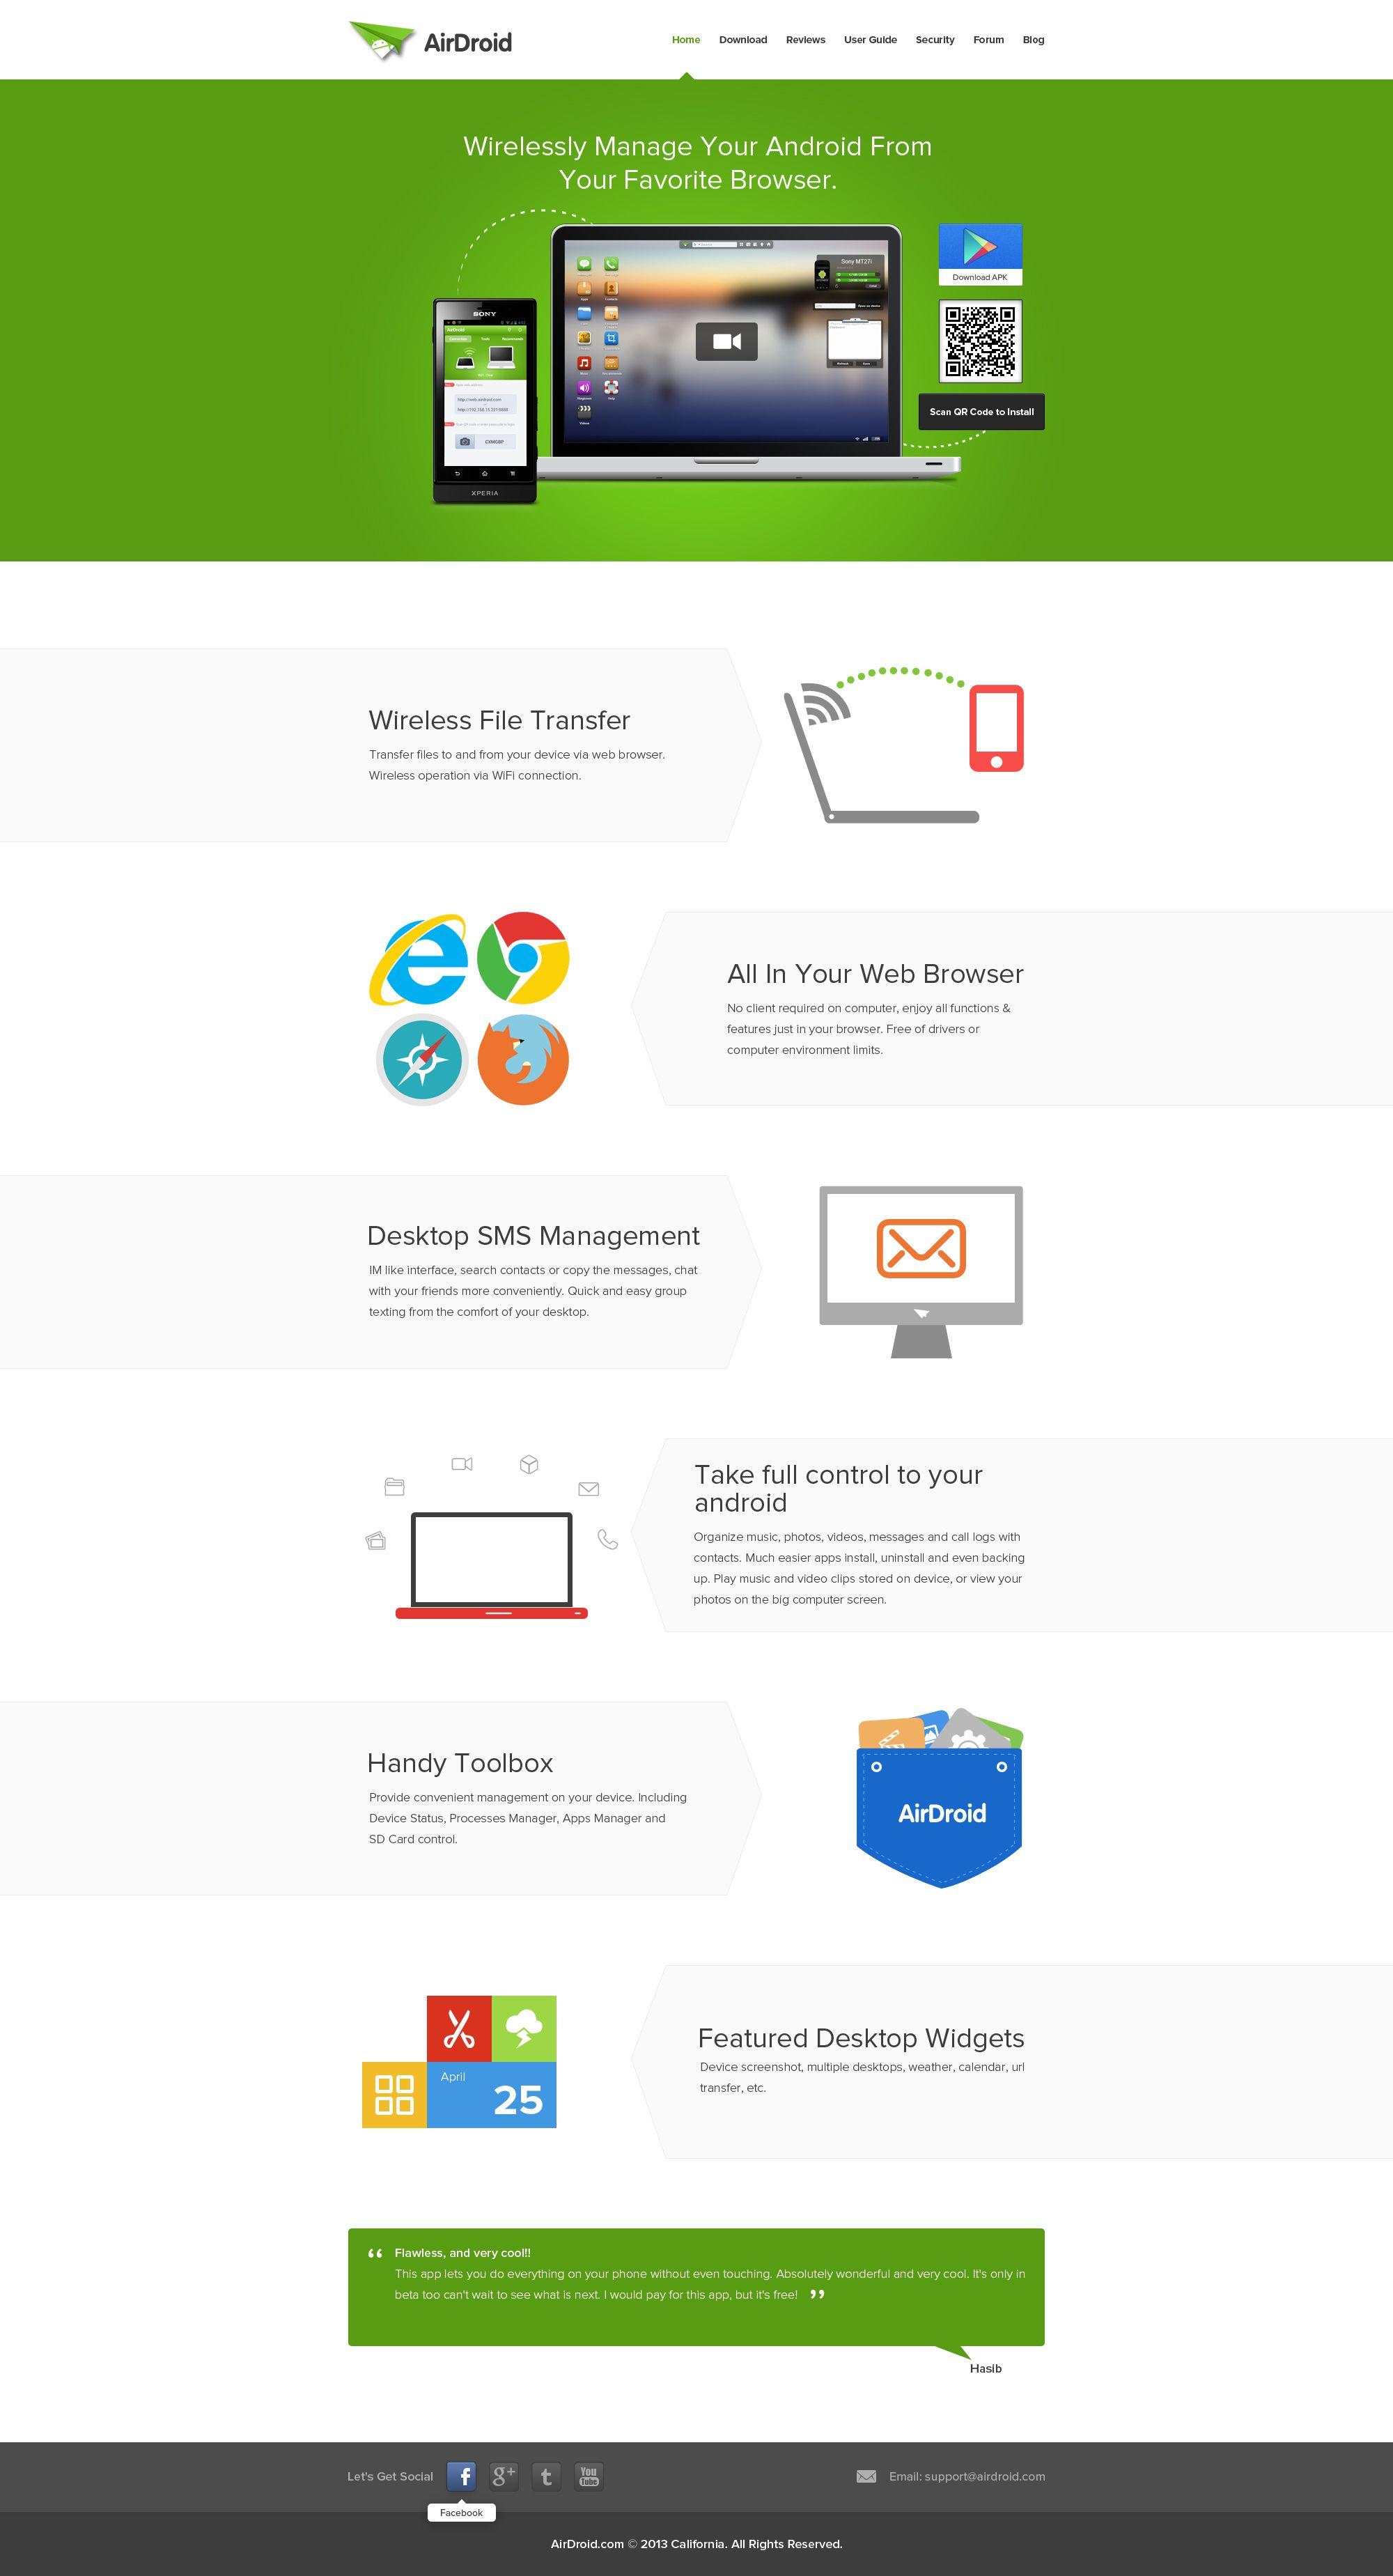 Air Droid Ultra Flat Minimal Web Design Minimal Web Design Minimal Website Design Web Design Gallery